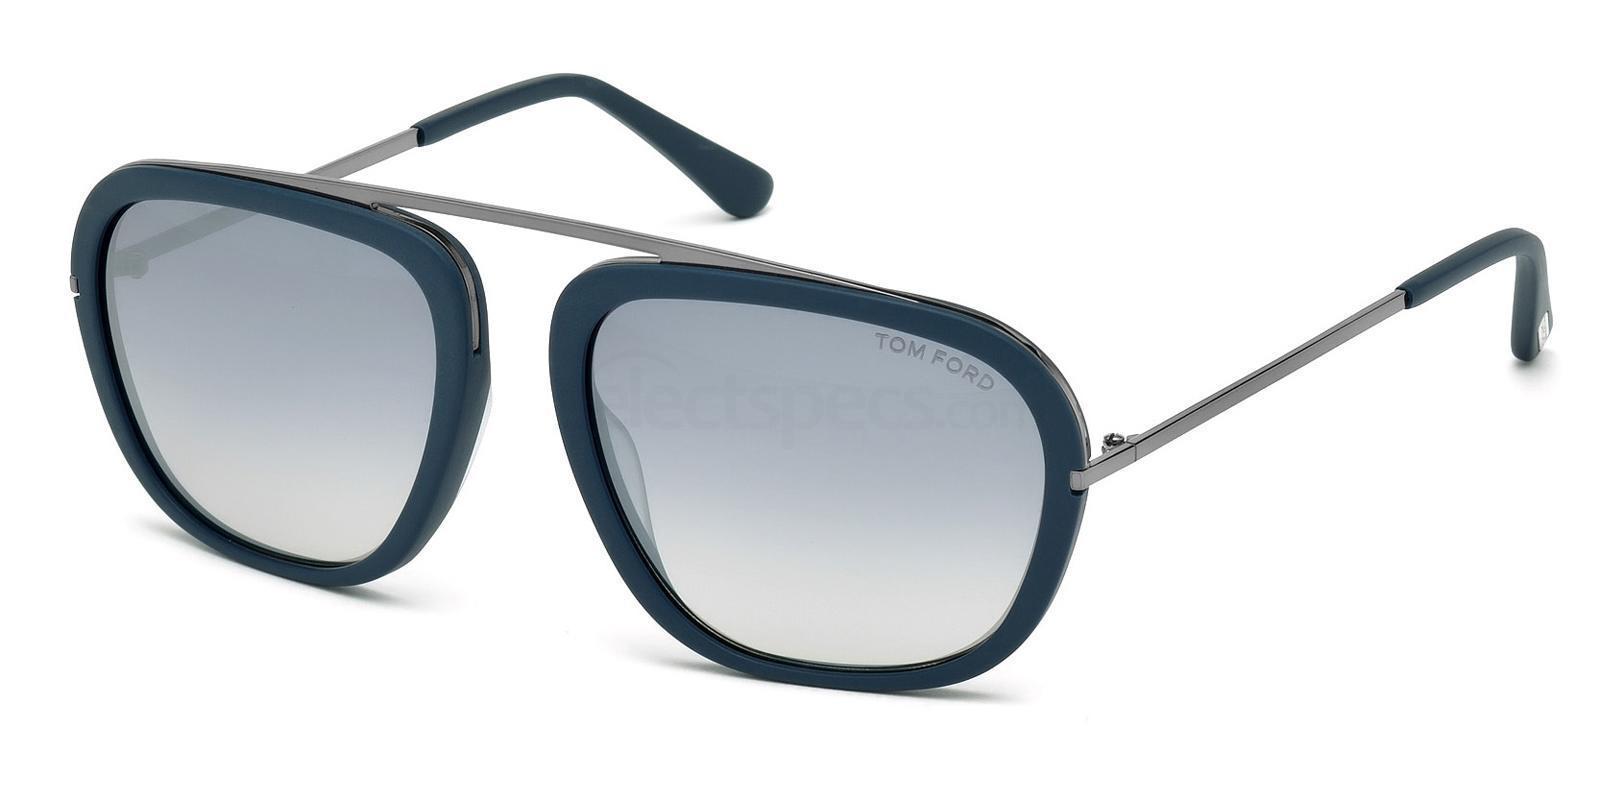 88C FT0453 Sunglasses, Tom Ford